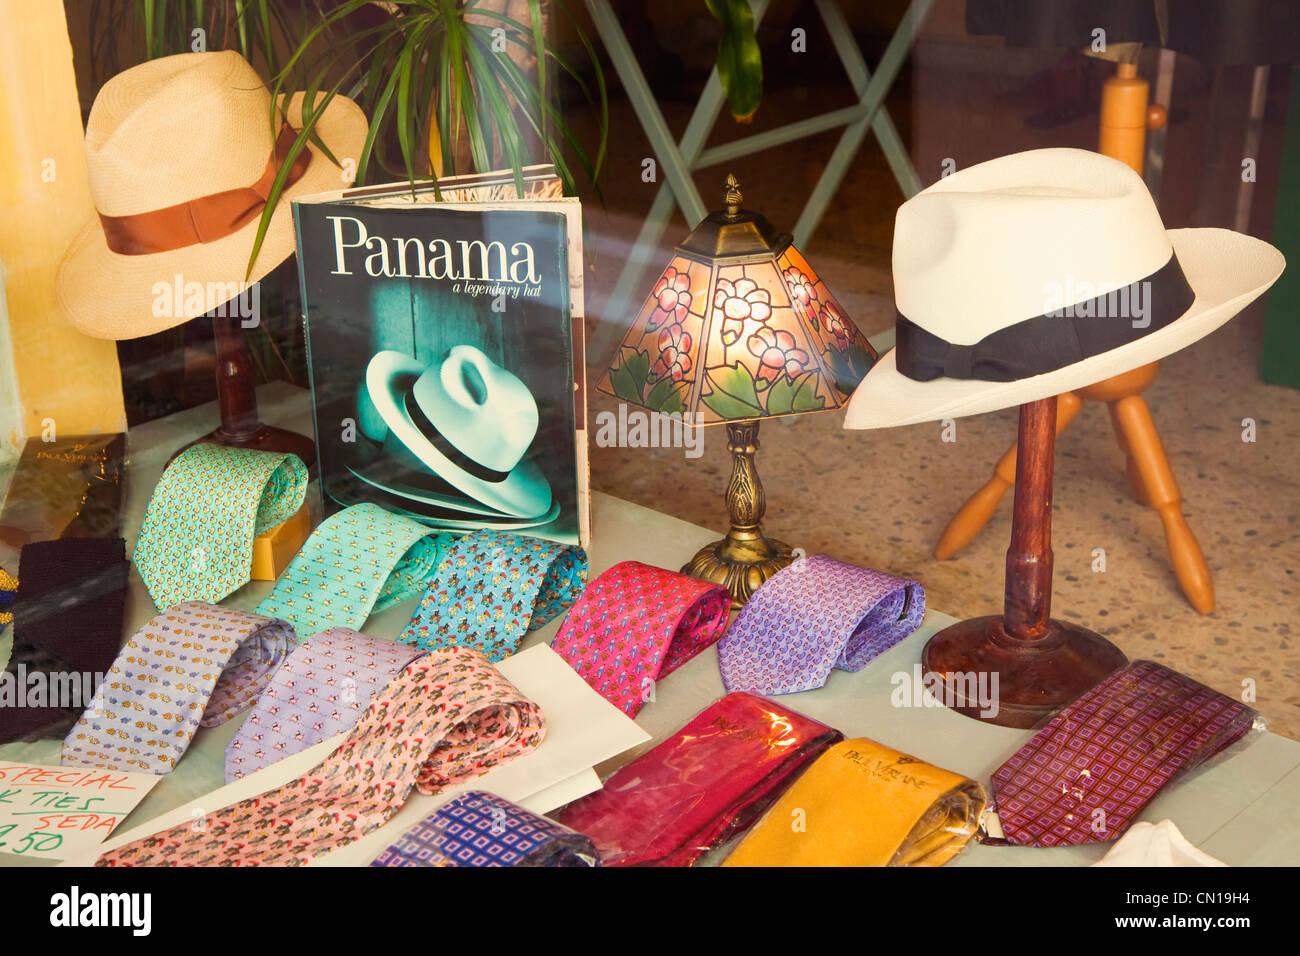 4cd6e32c166 Marbella Malaga Province Costa del Sol Spain. Panama hats and silk ties in  shop window